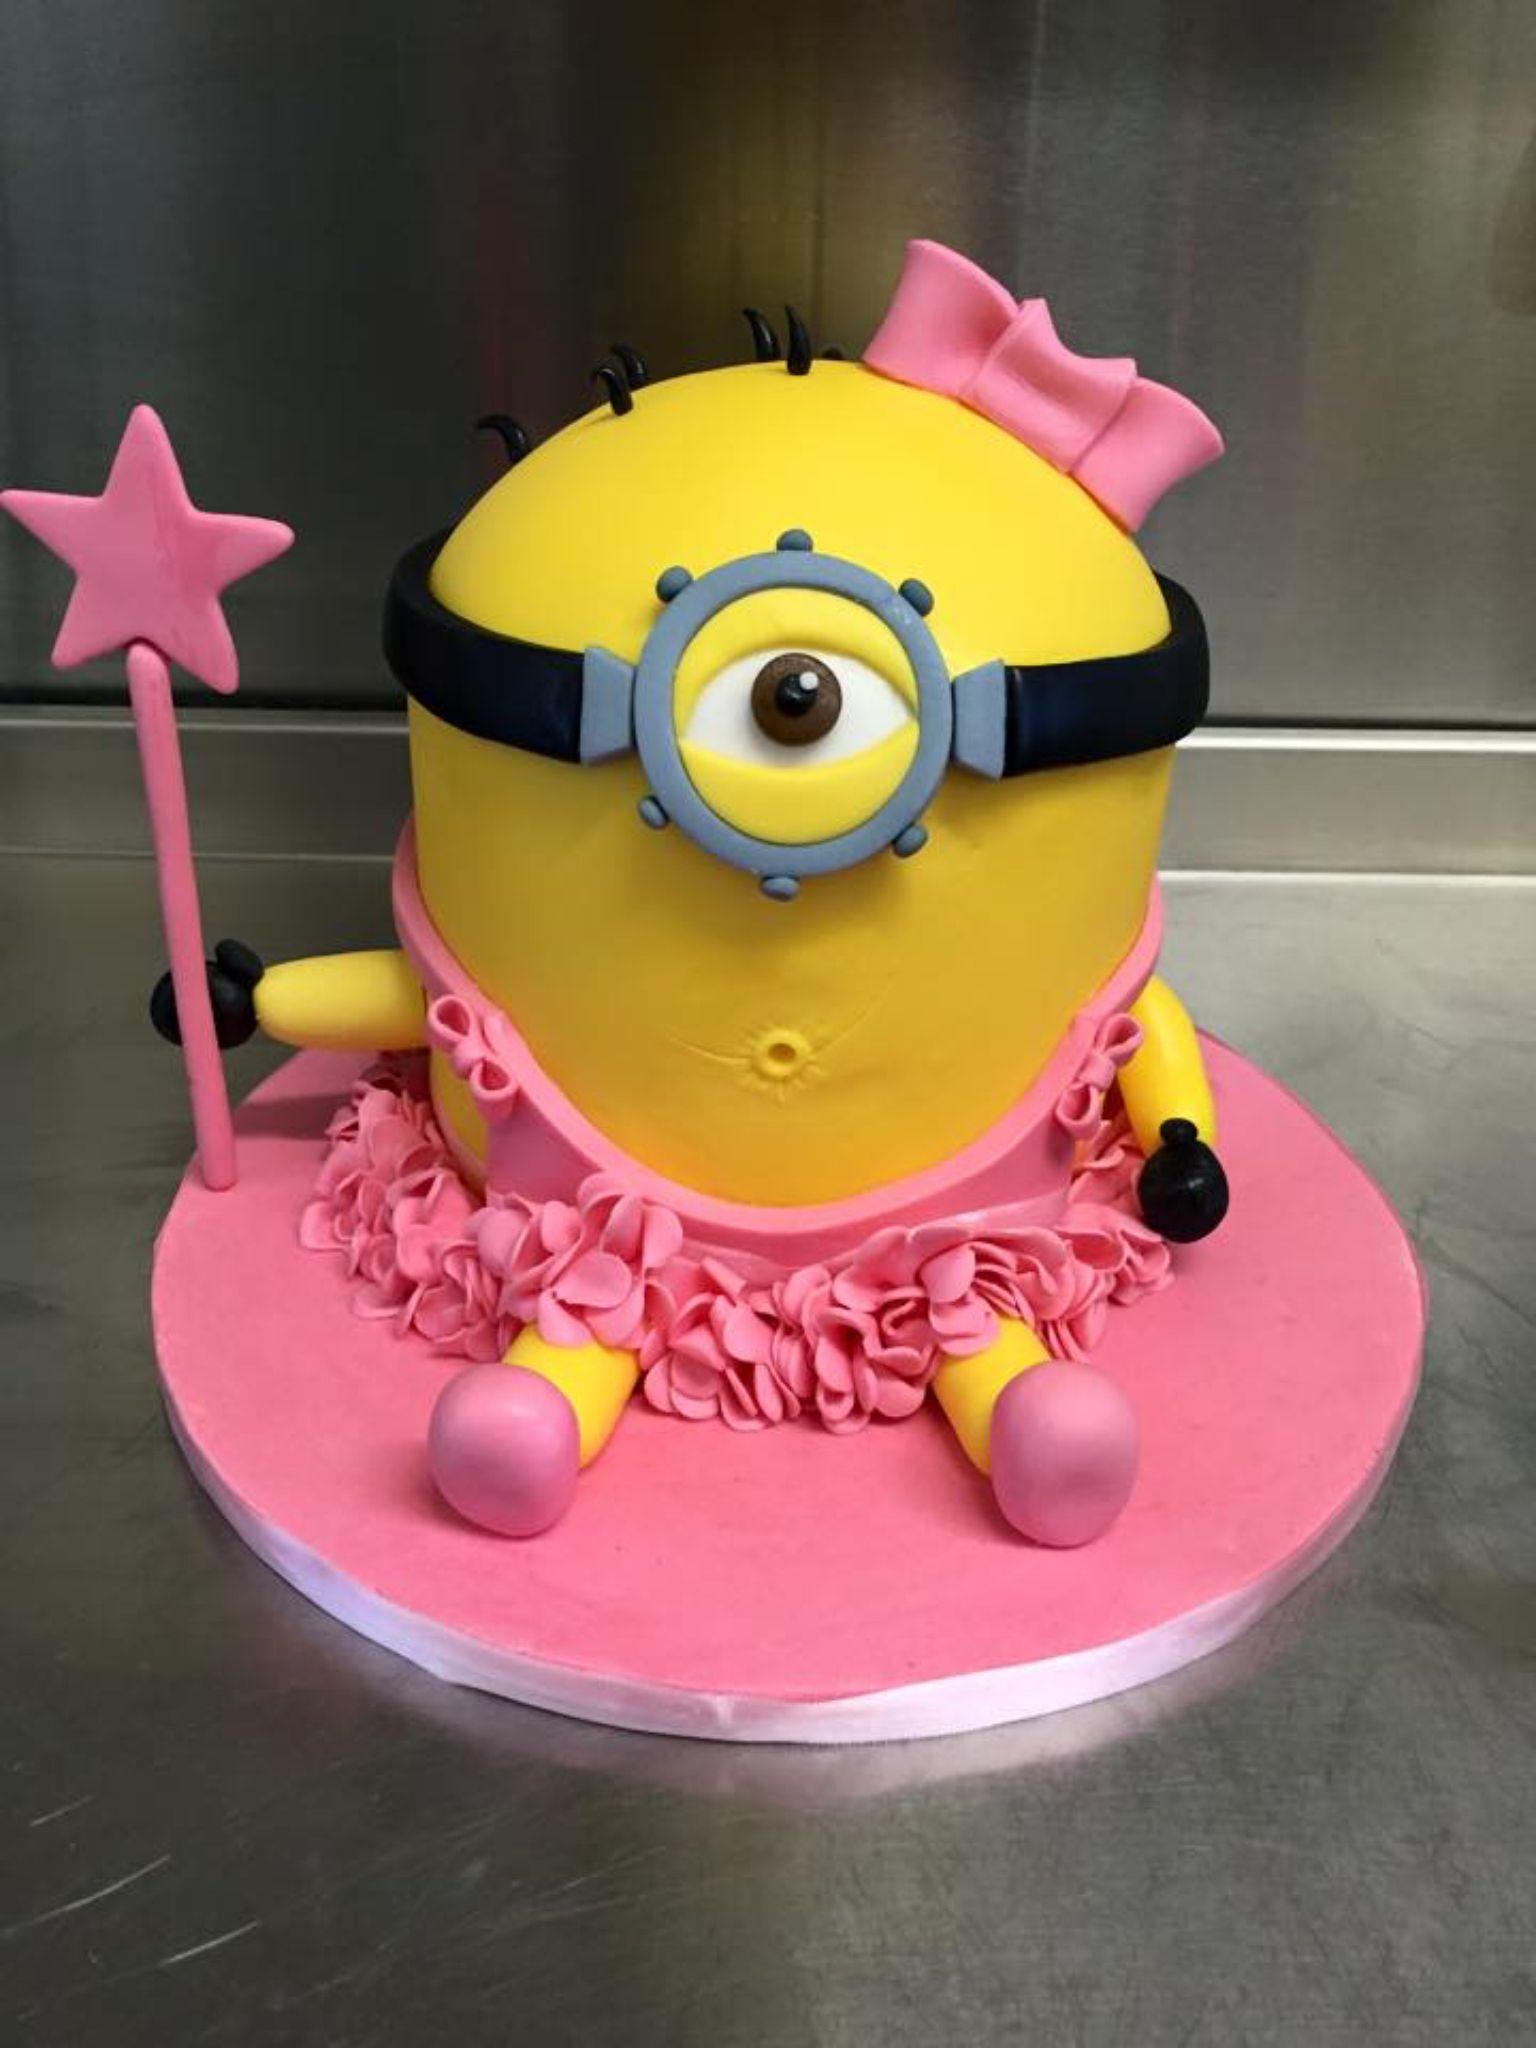 Princess minion birthday cake | Celebration cakes | Pinterest ...